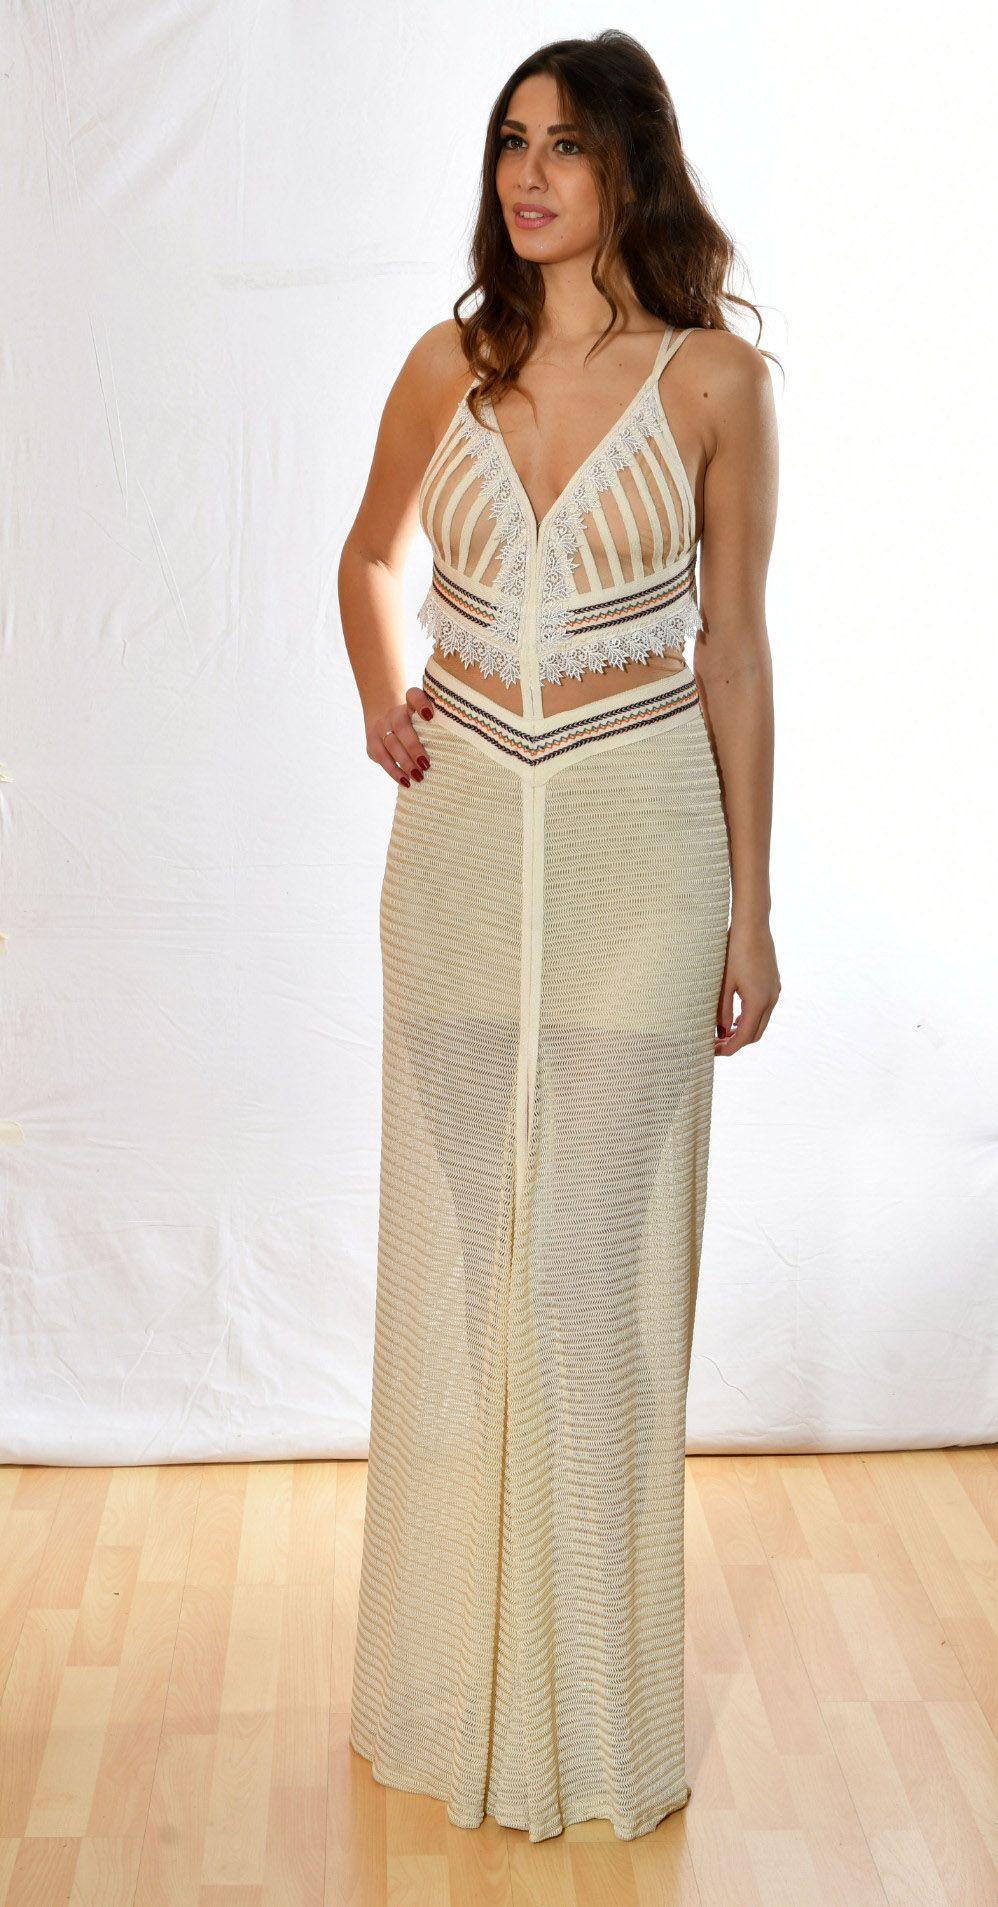 3d08a93db844 Μακρύ βραδυνό φόρεμα σε μπέζ αποχρώσεις με διαφάνεια στο κάτω μέρος της  φούστας και διαφάνειες τούλι